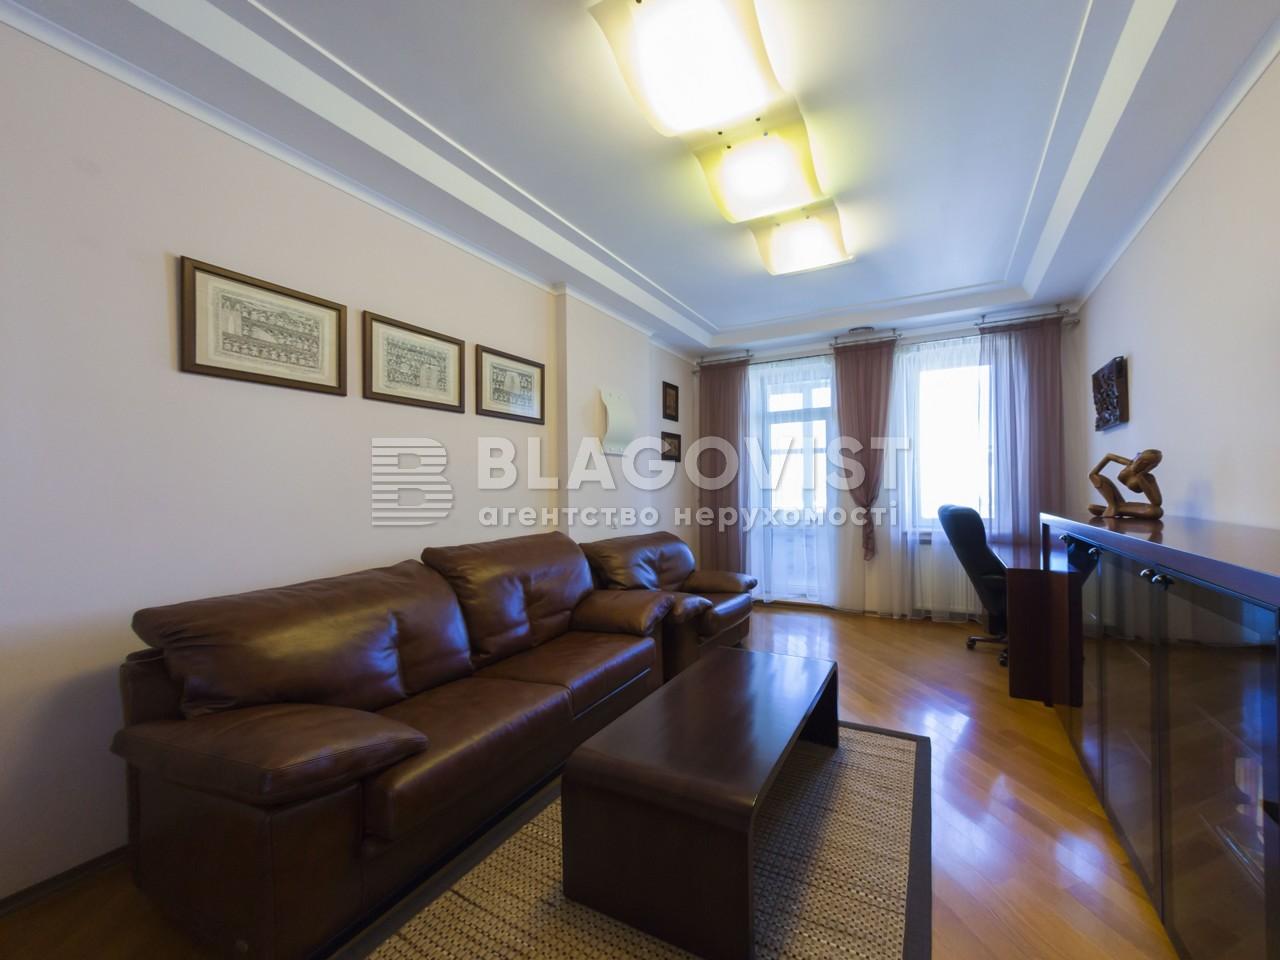 Квартира R-20216, Ковпака, 17, Киев - Фото 11